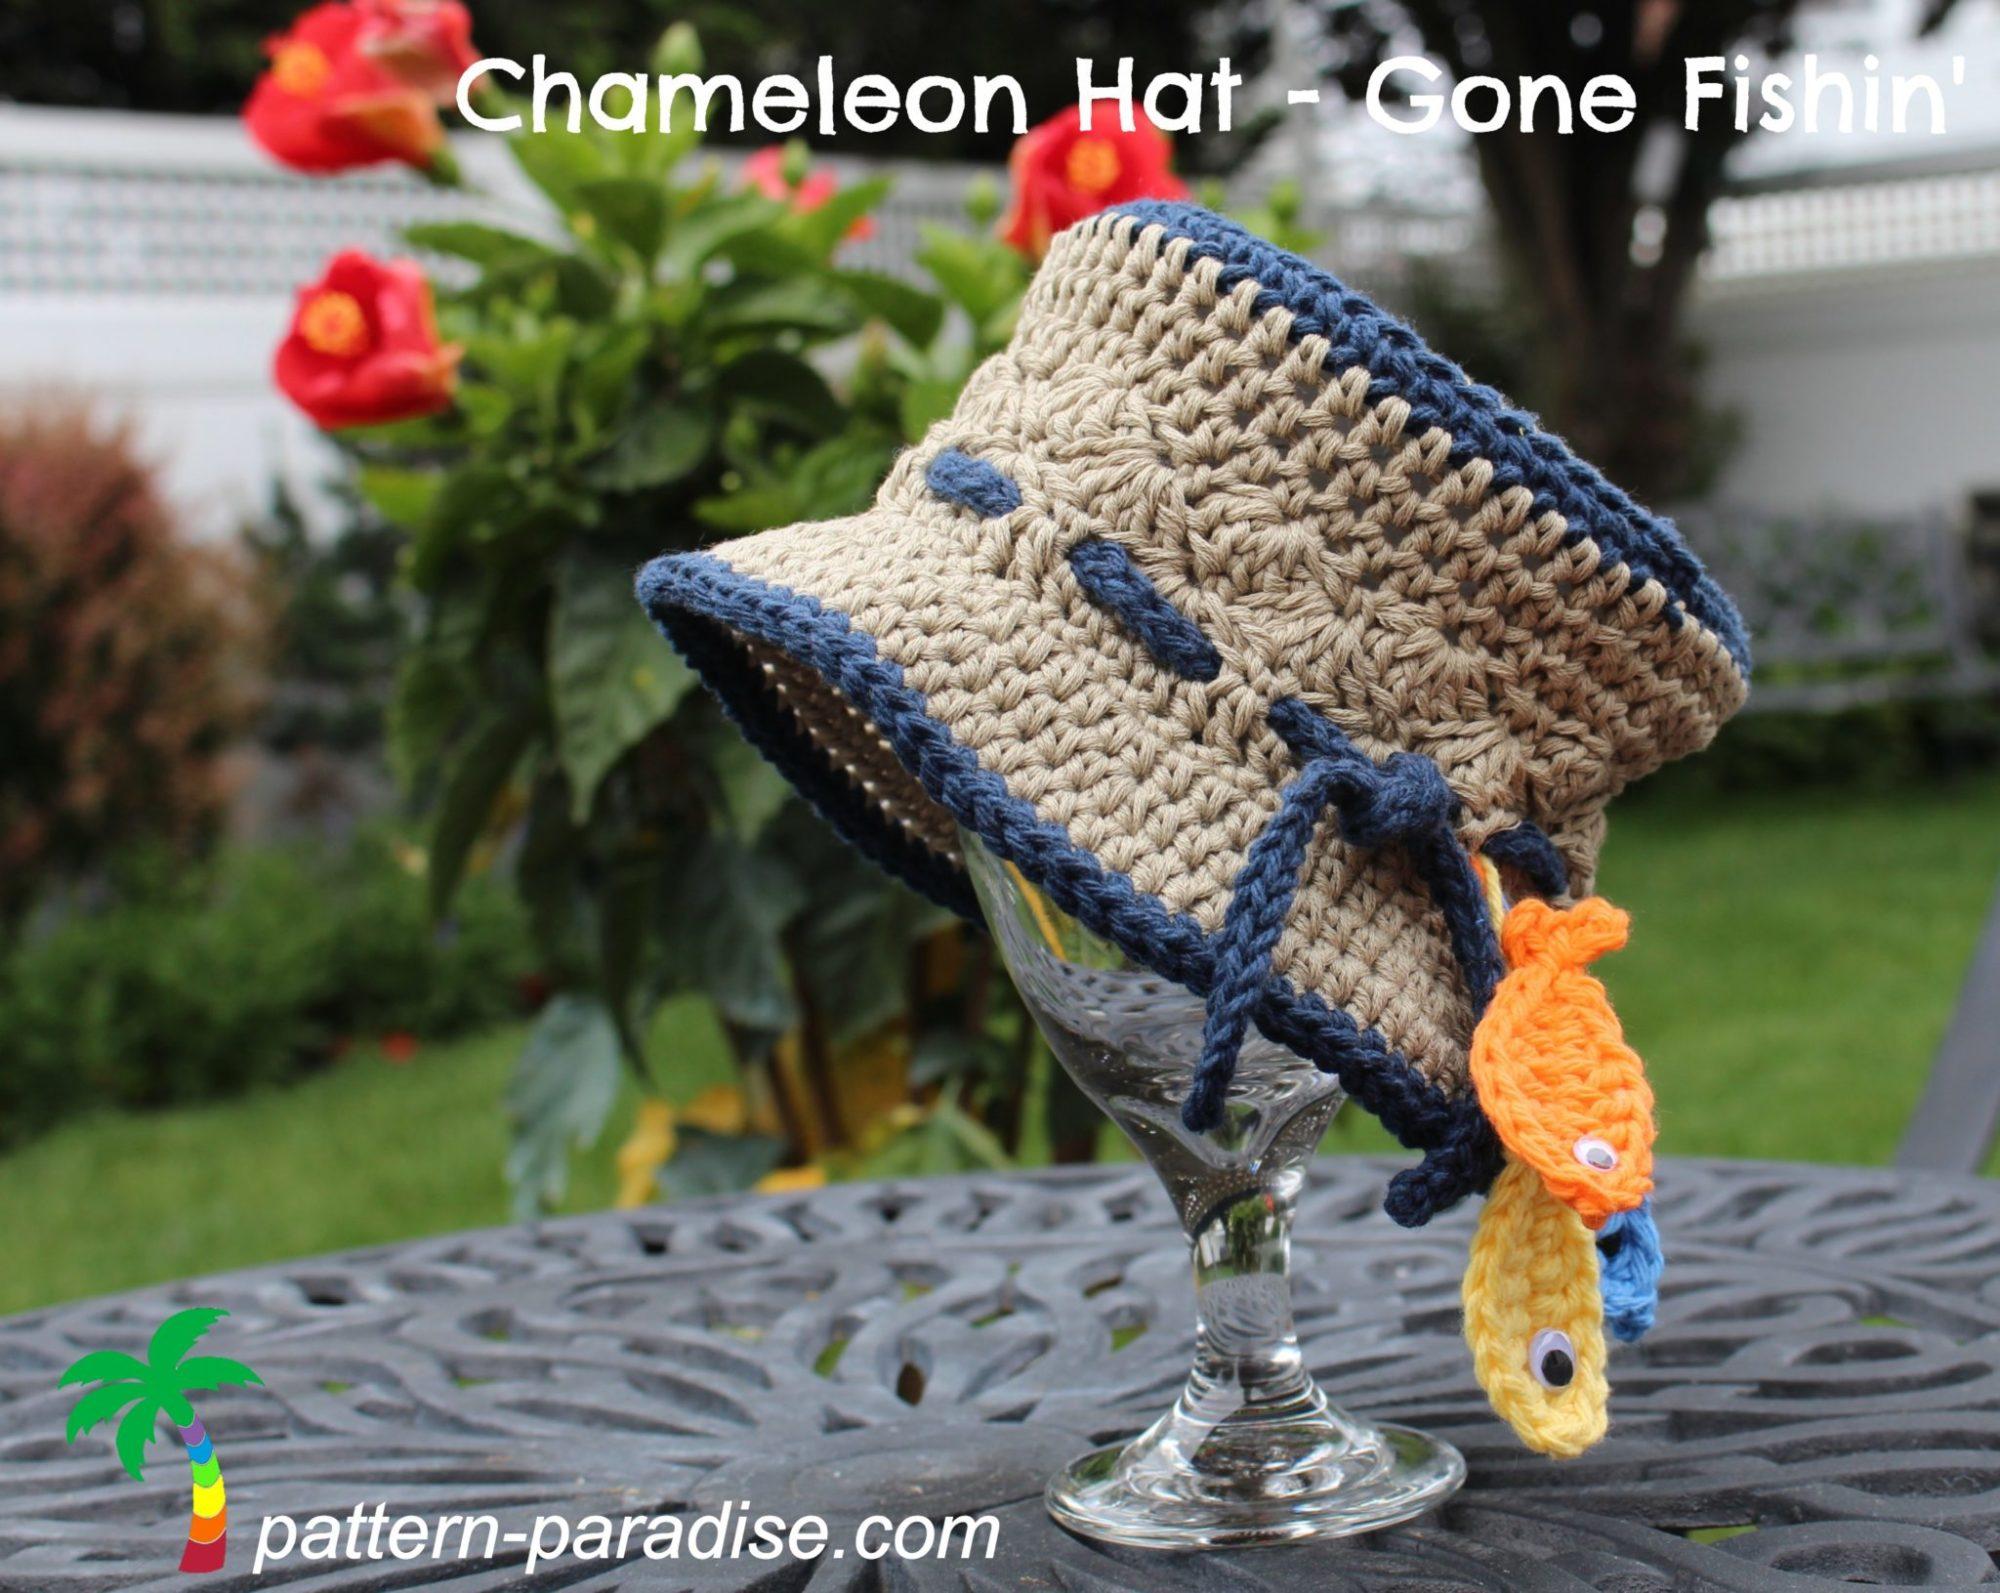 Free Crochet Pattern Chameleon Hat Gone Fishin Pattern Paradise